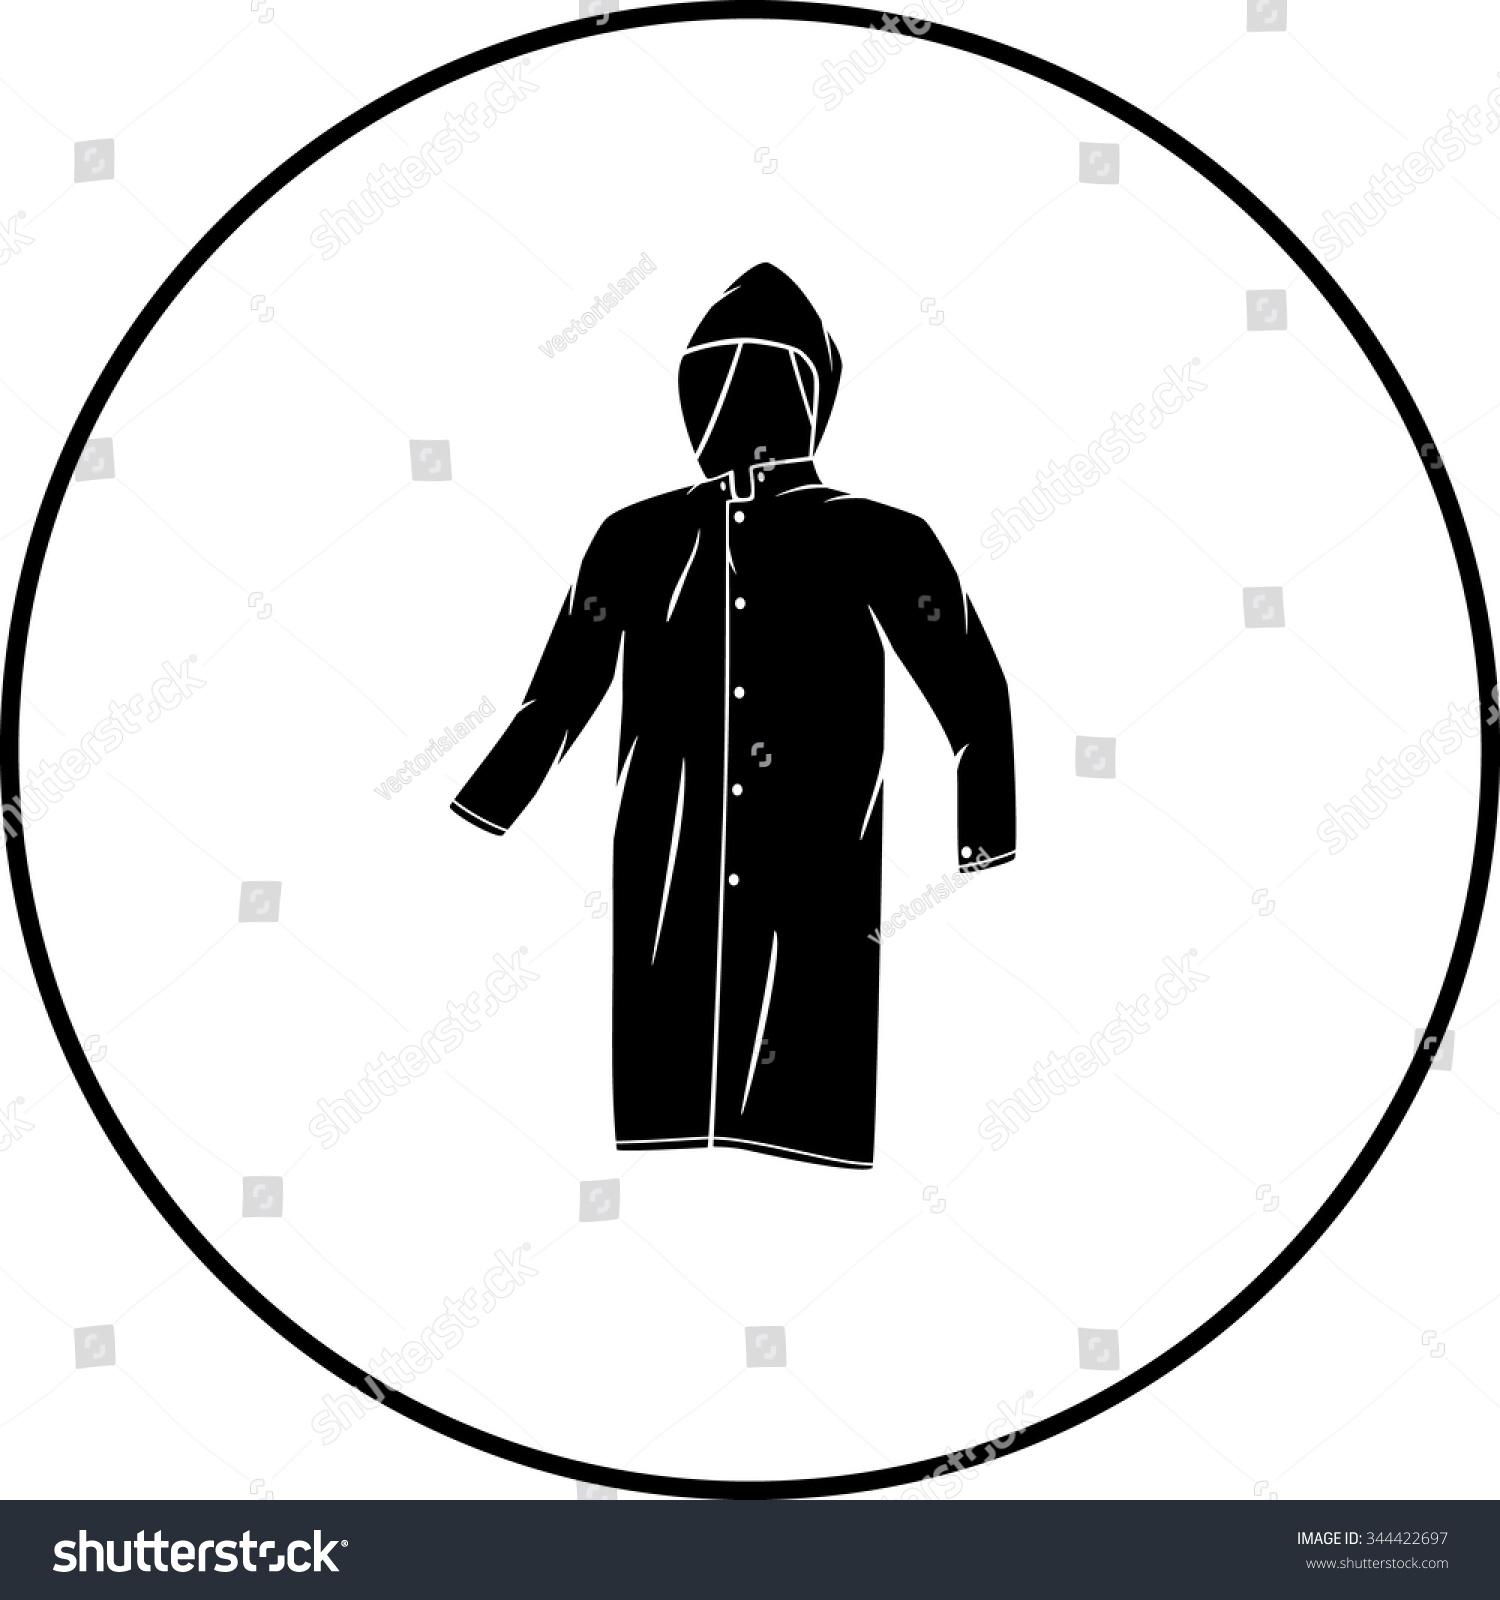 Raincoat Symbol Stock Vector Royalty Free 344422697 Shutterstock